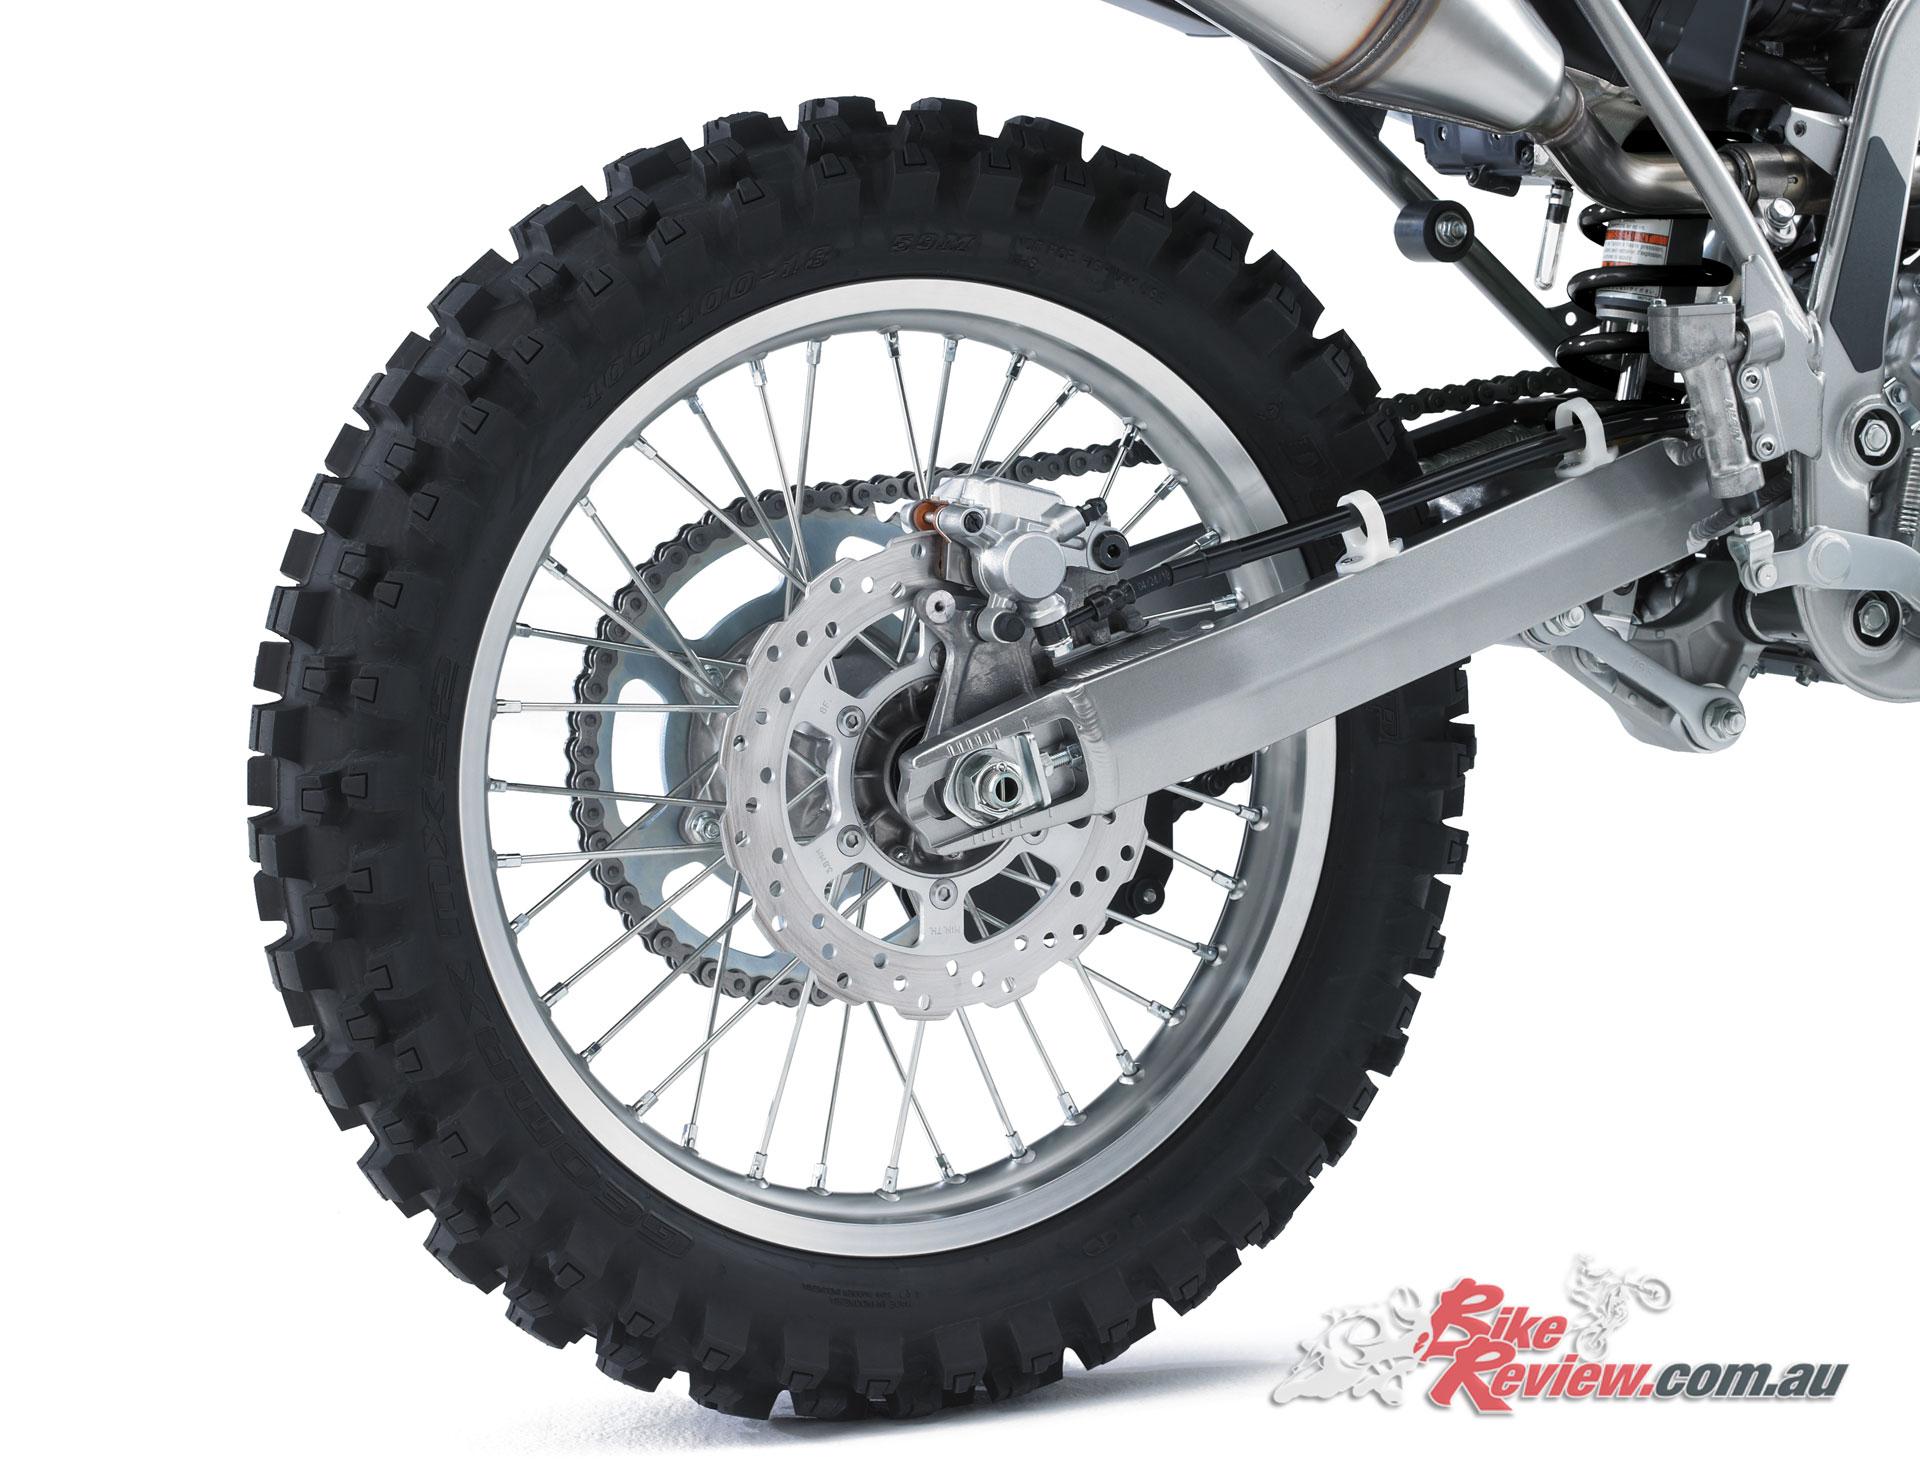 2020 Kawasaki KLX300R - 18in rear with 240mm rotor and single-piston caliper